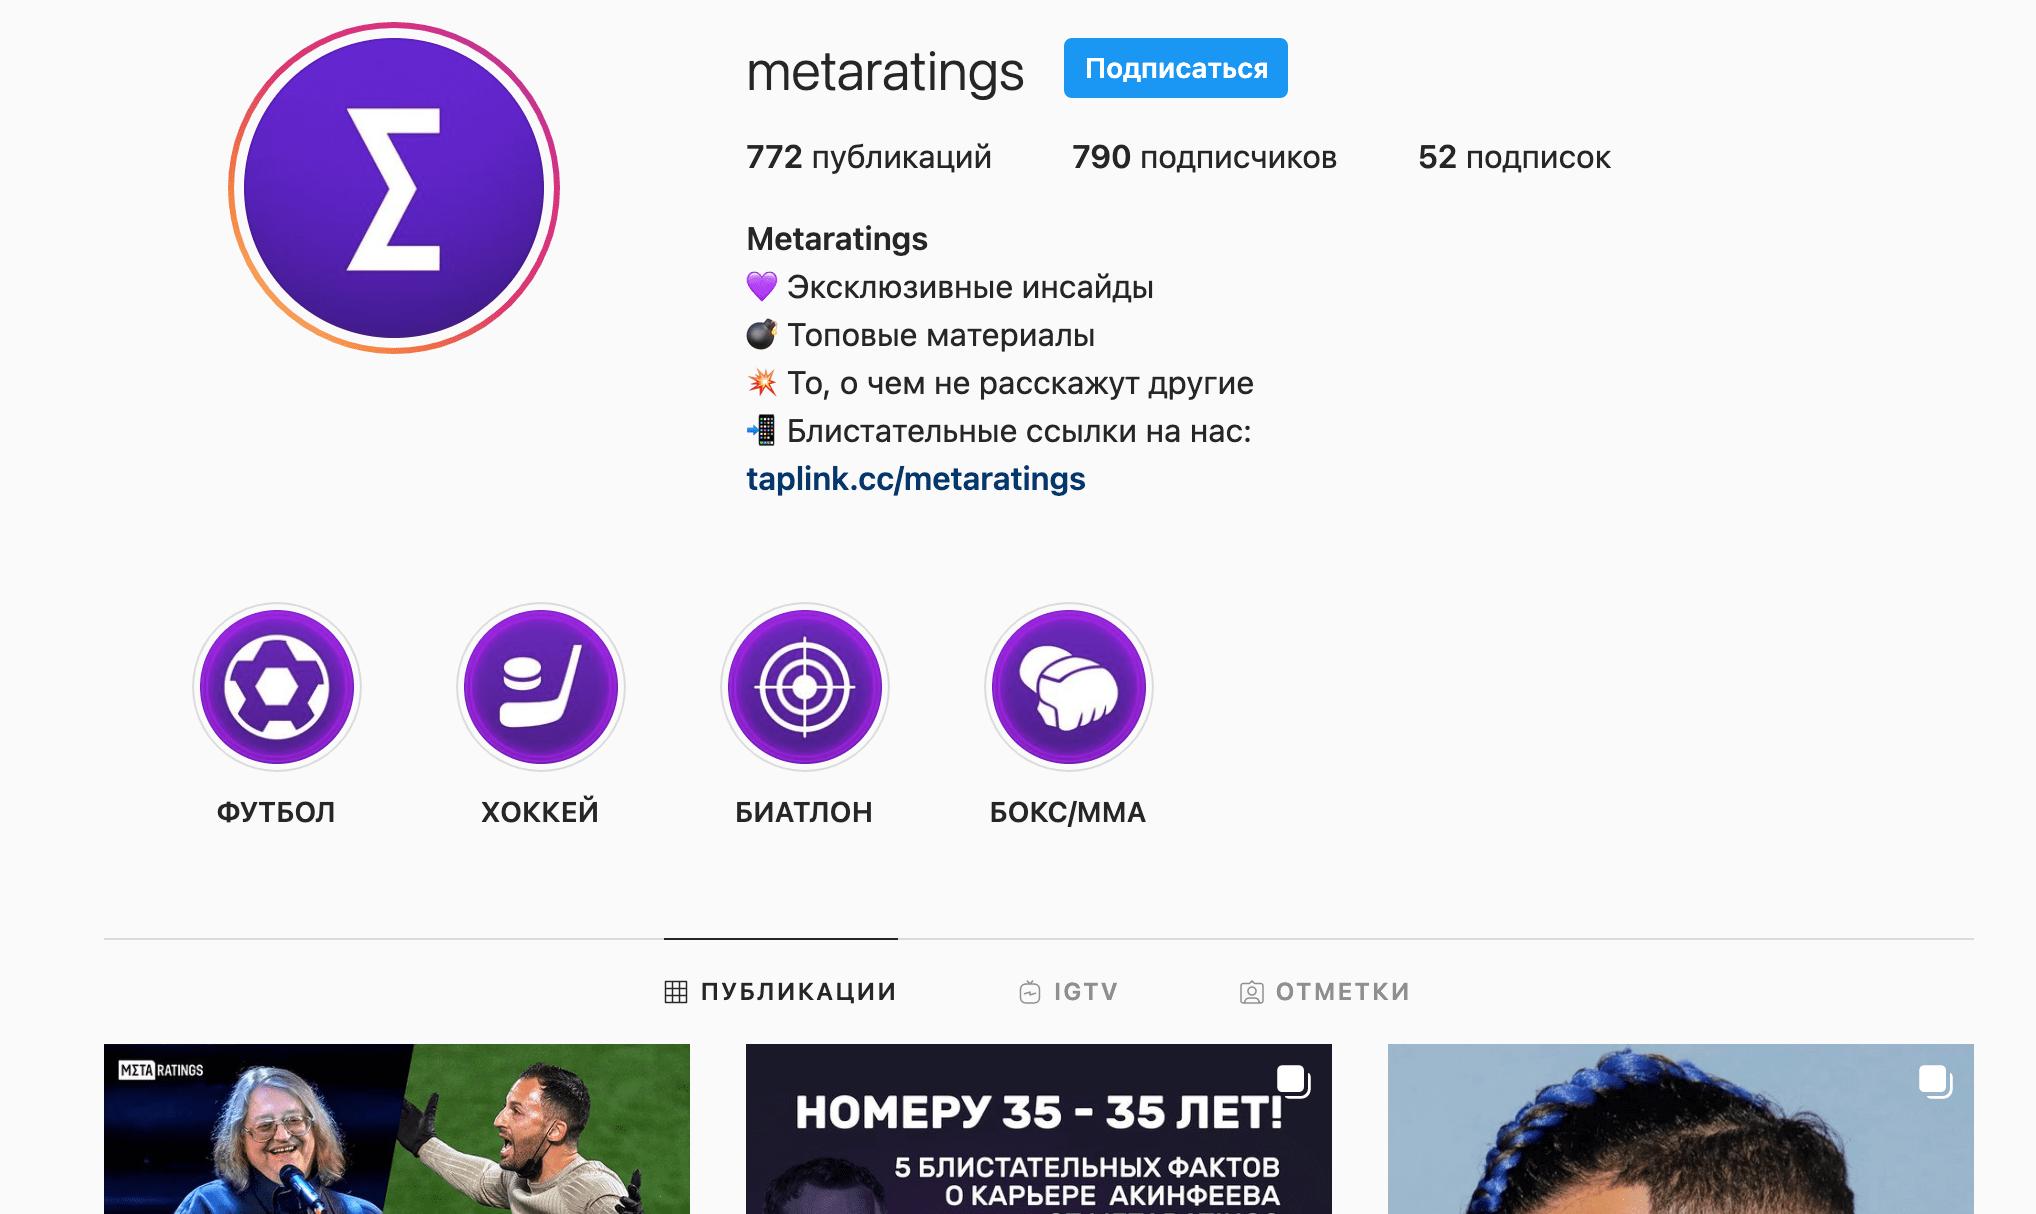 Инстграм Metaratings.ru (Метаратингс ру)